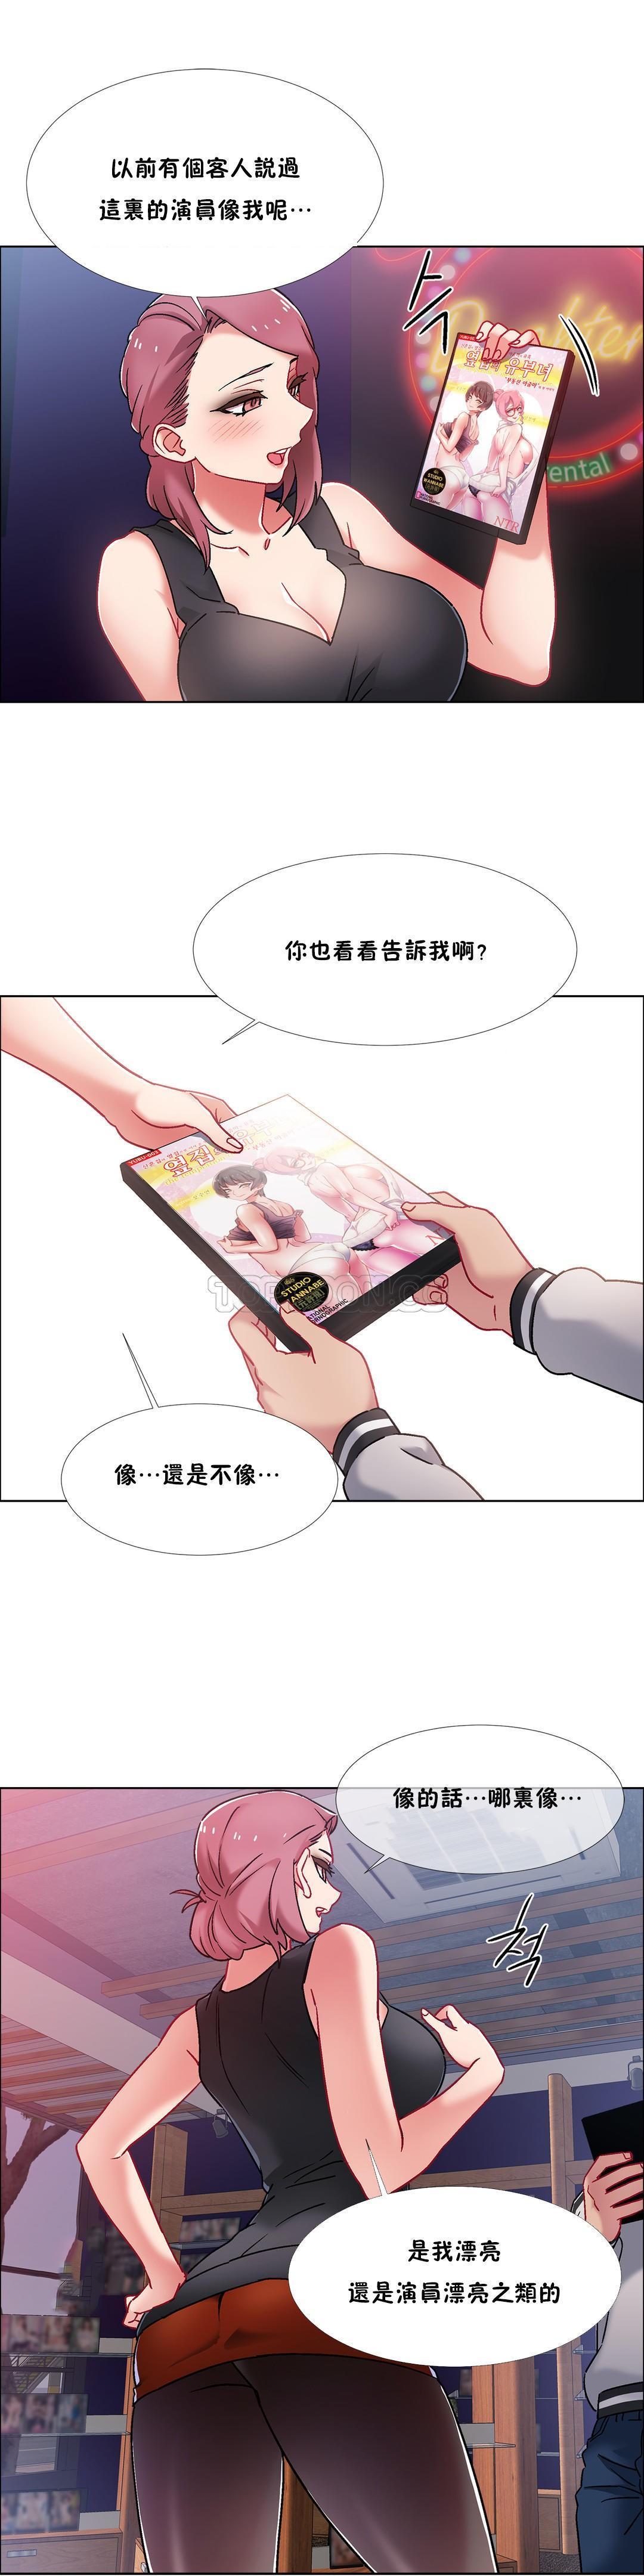 [Studio Wannabe] Rental Girls | 出租女郎 Ch. 33-58 [Chinese]  第二季 完结 228